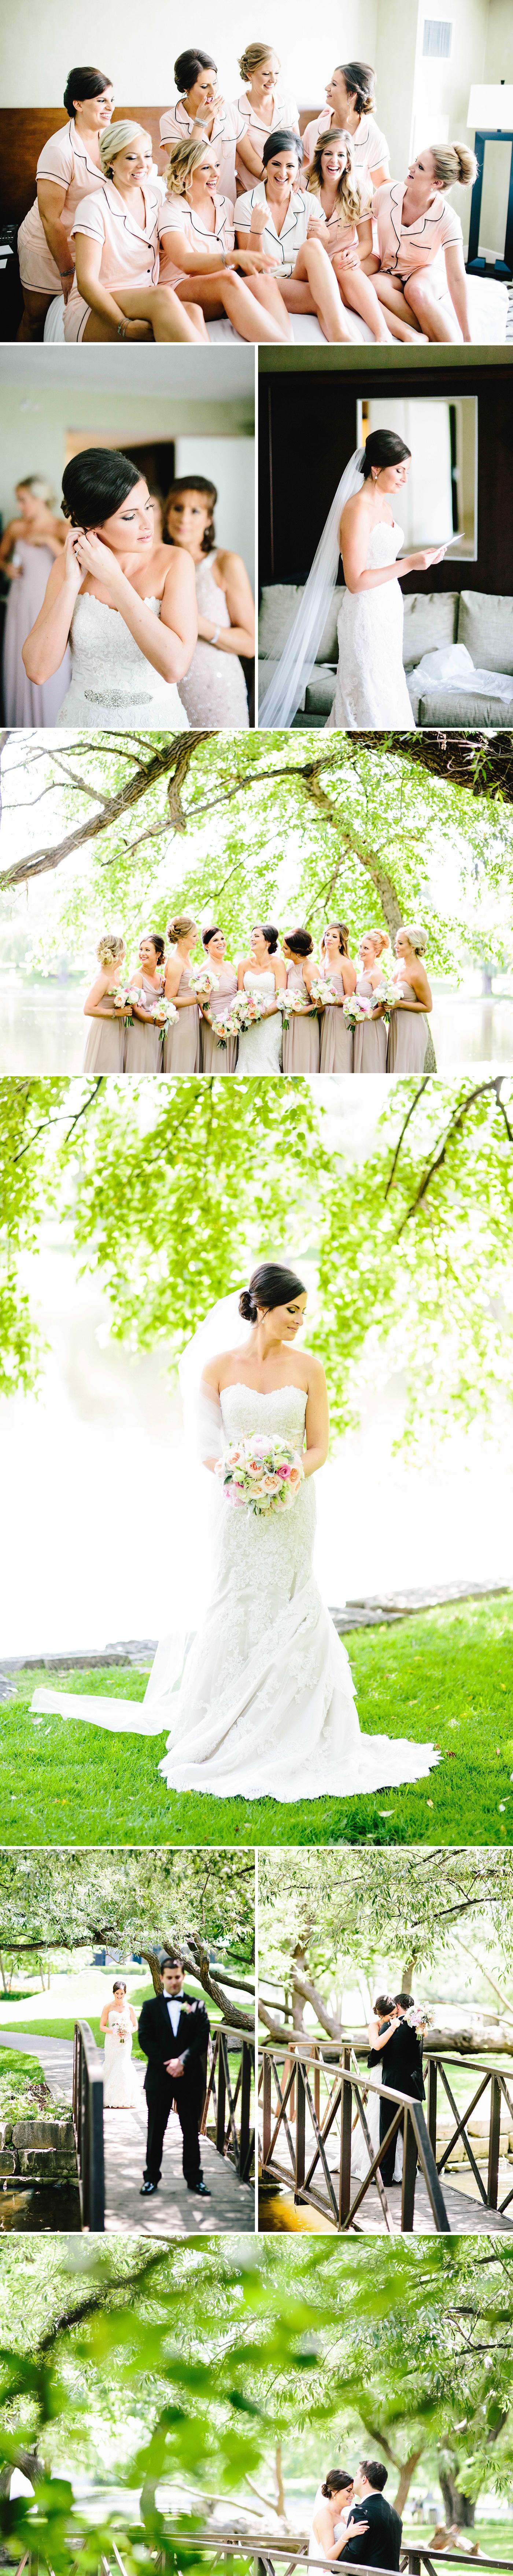 chicago-fine-art-wedding-photography-marshall